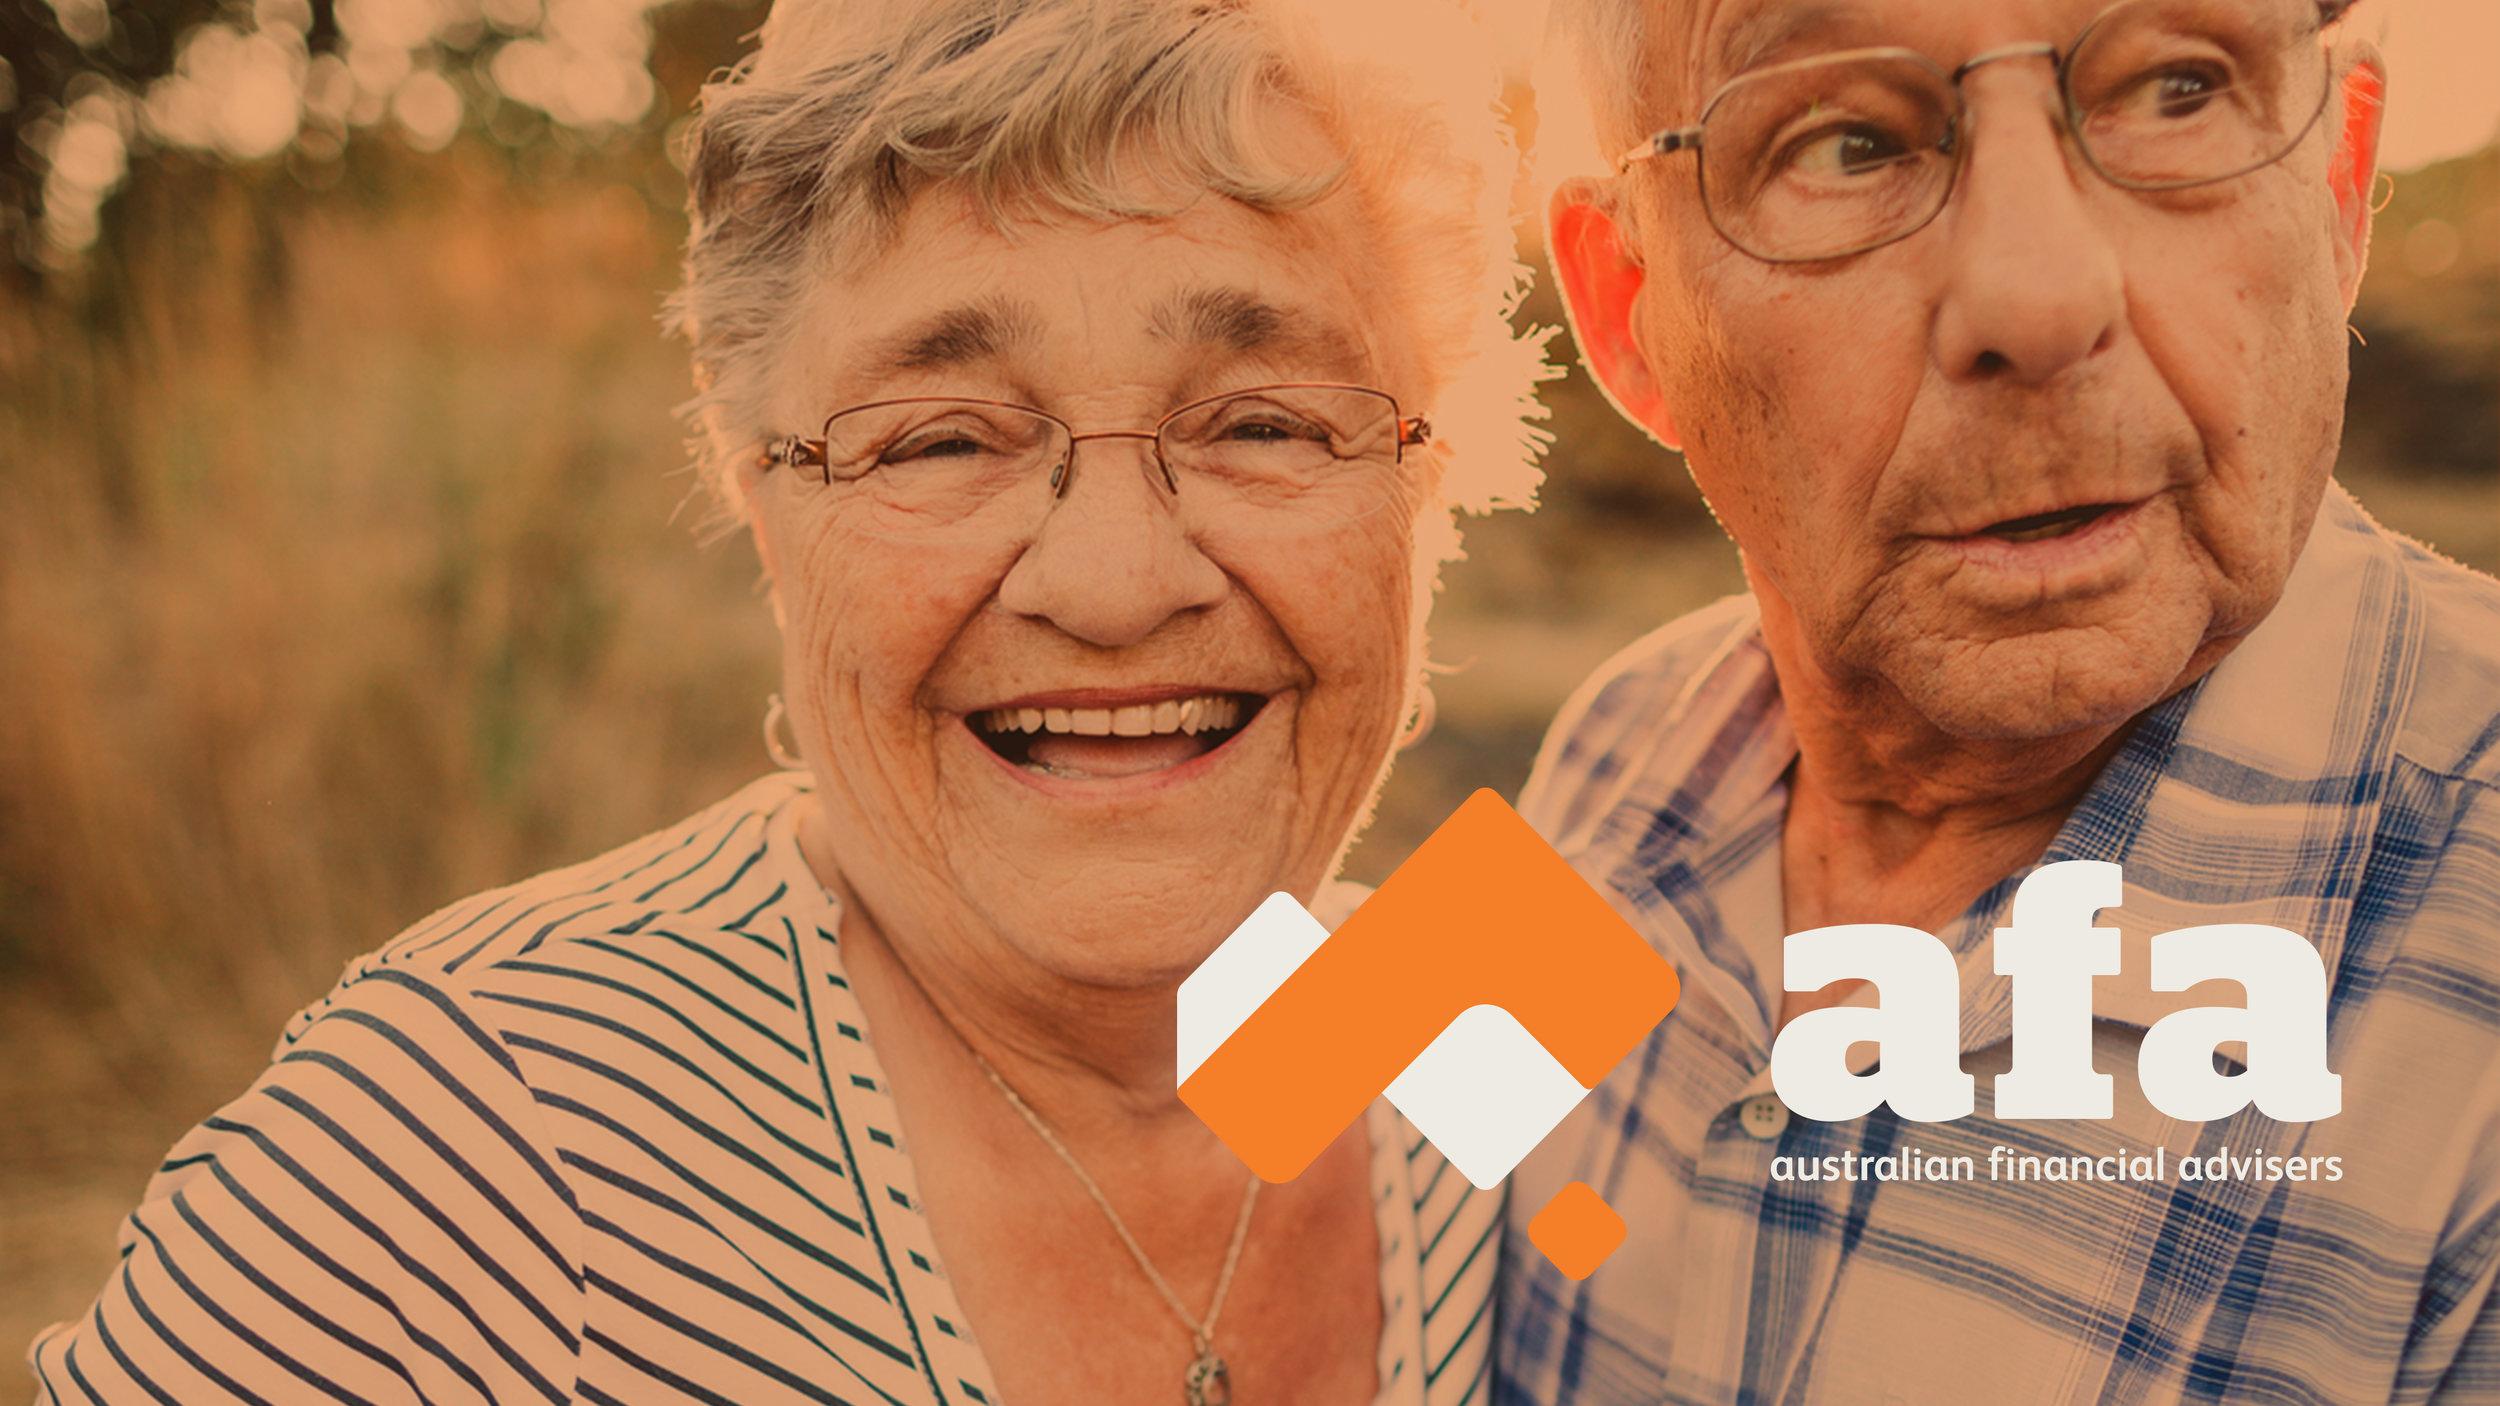 AFA_australian_financial_advisory_brand_Identity.jpg